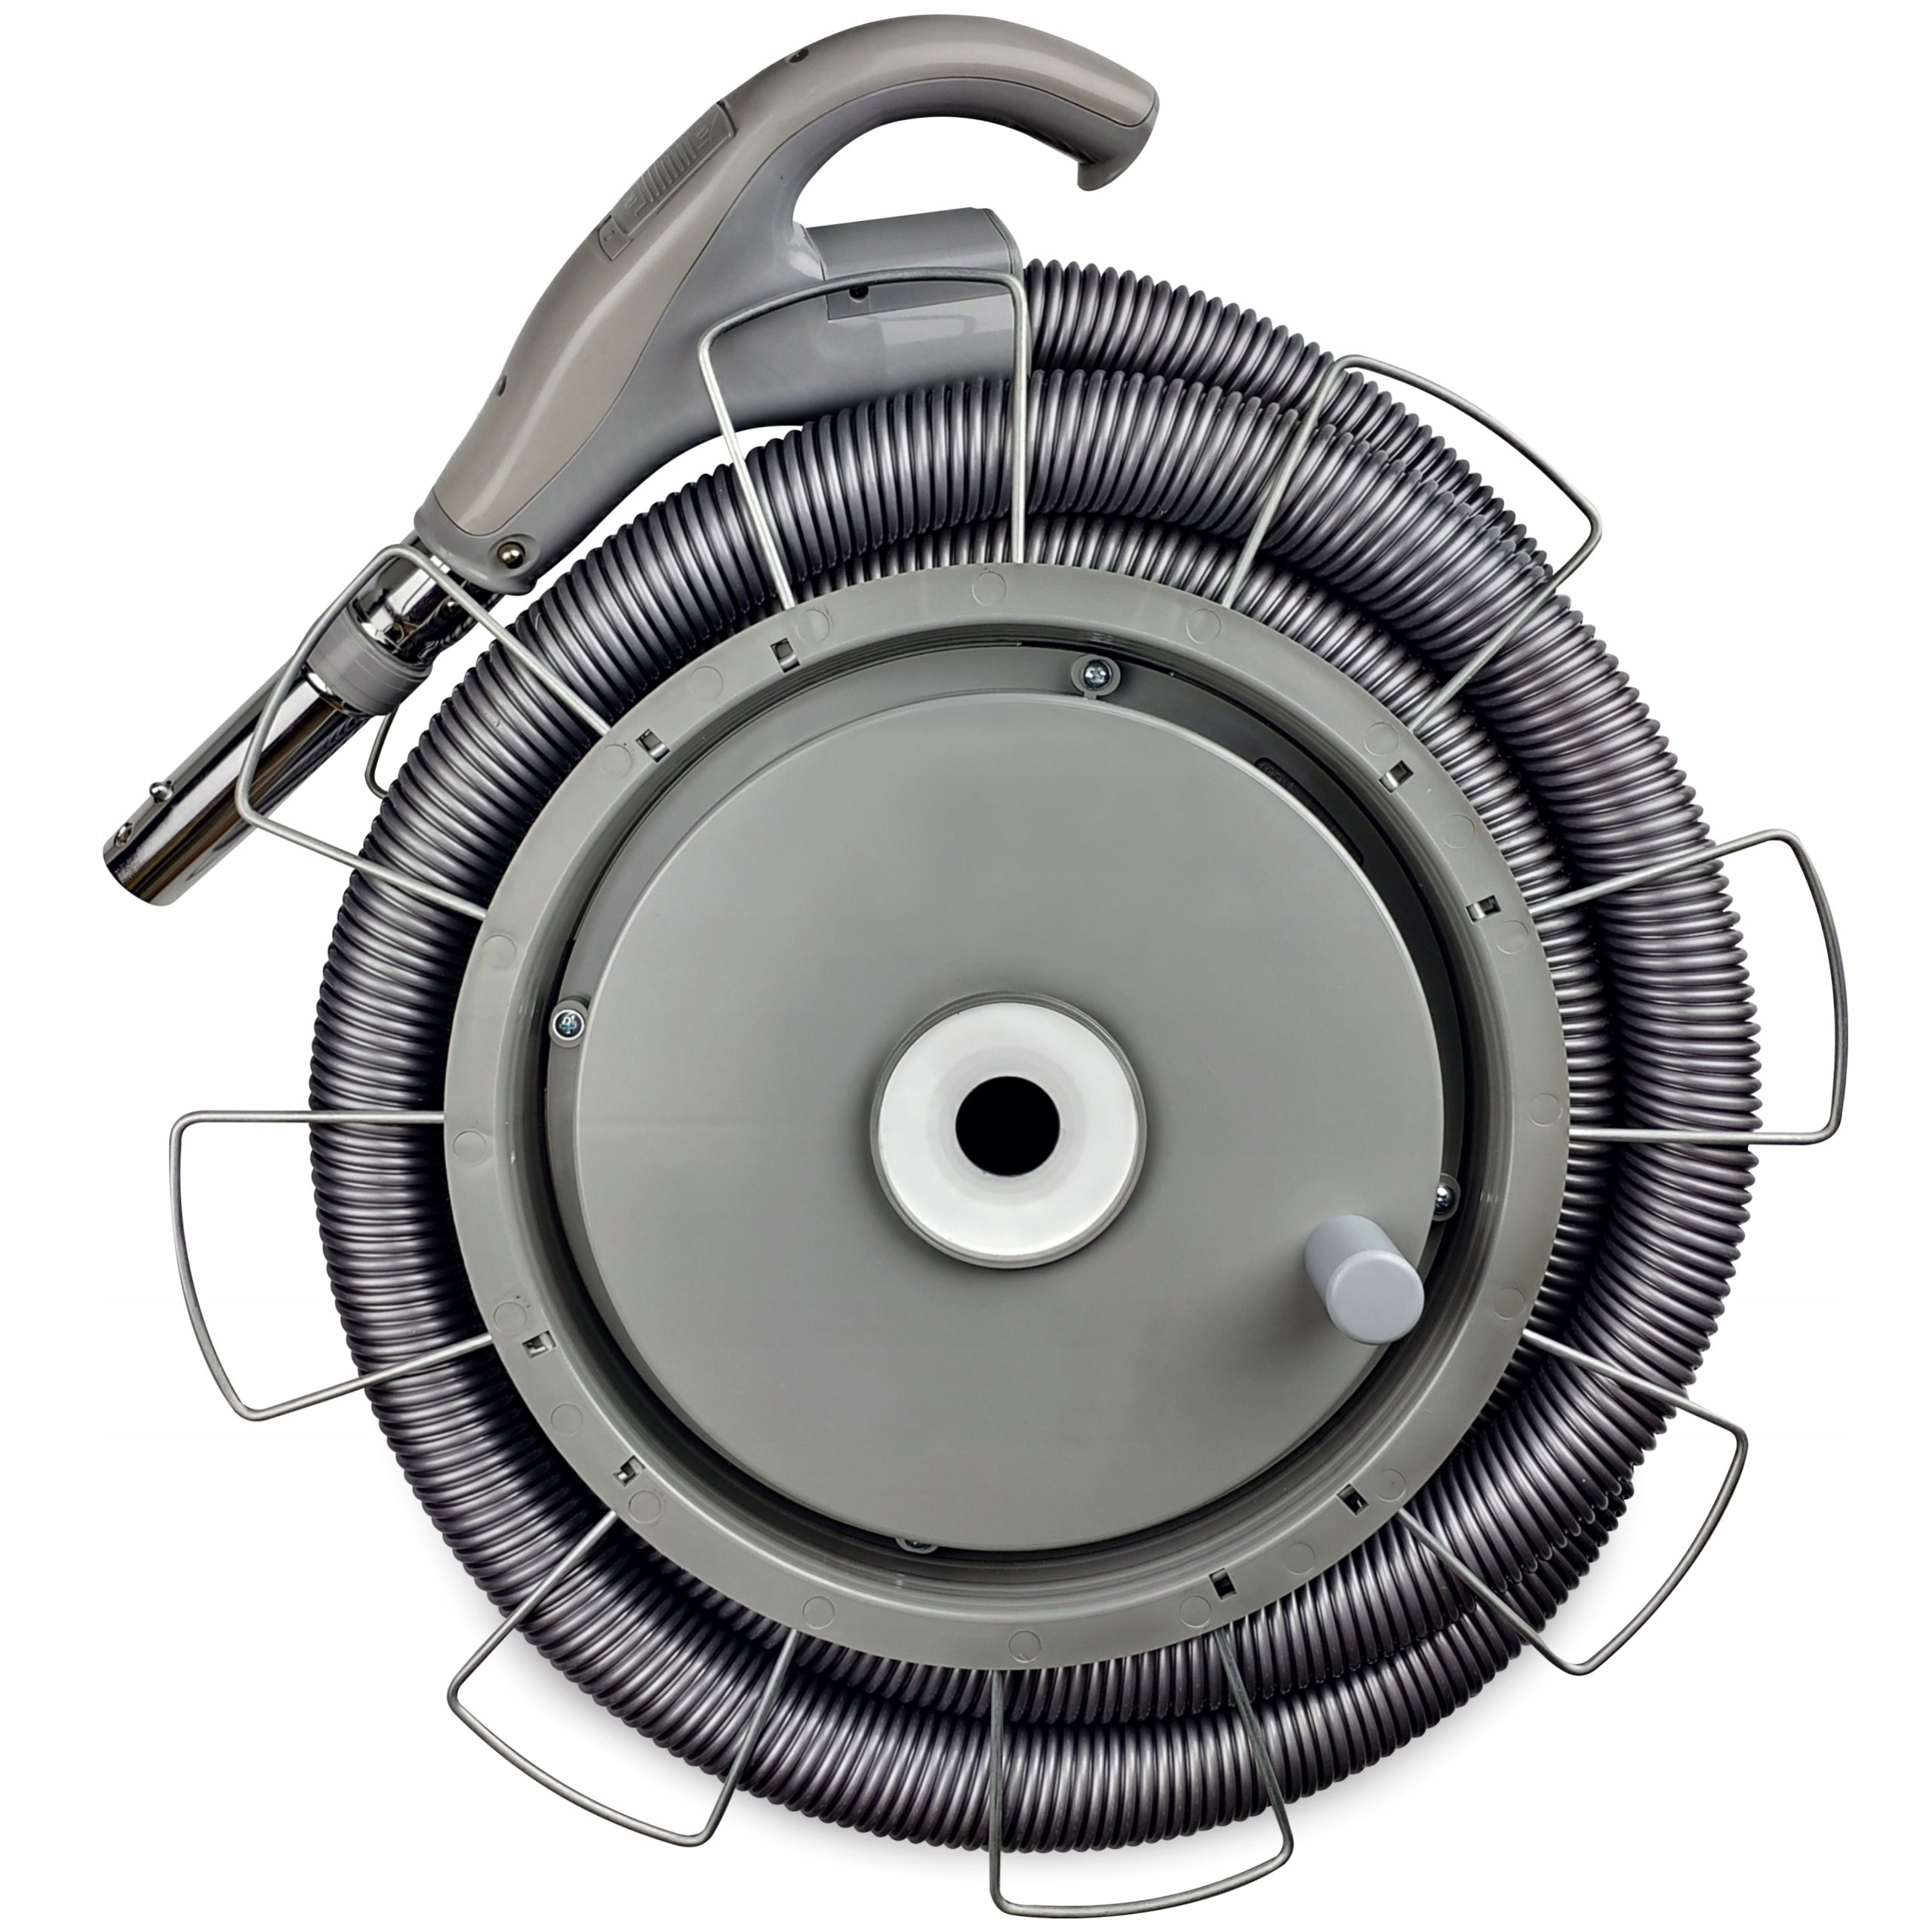 Всасывающий шланг 12м + Retractor VROOM CENTRAL VACUUM CLEANER